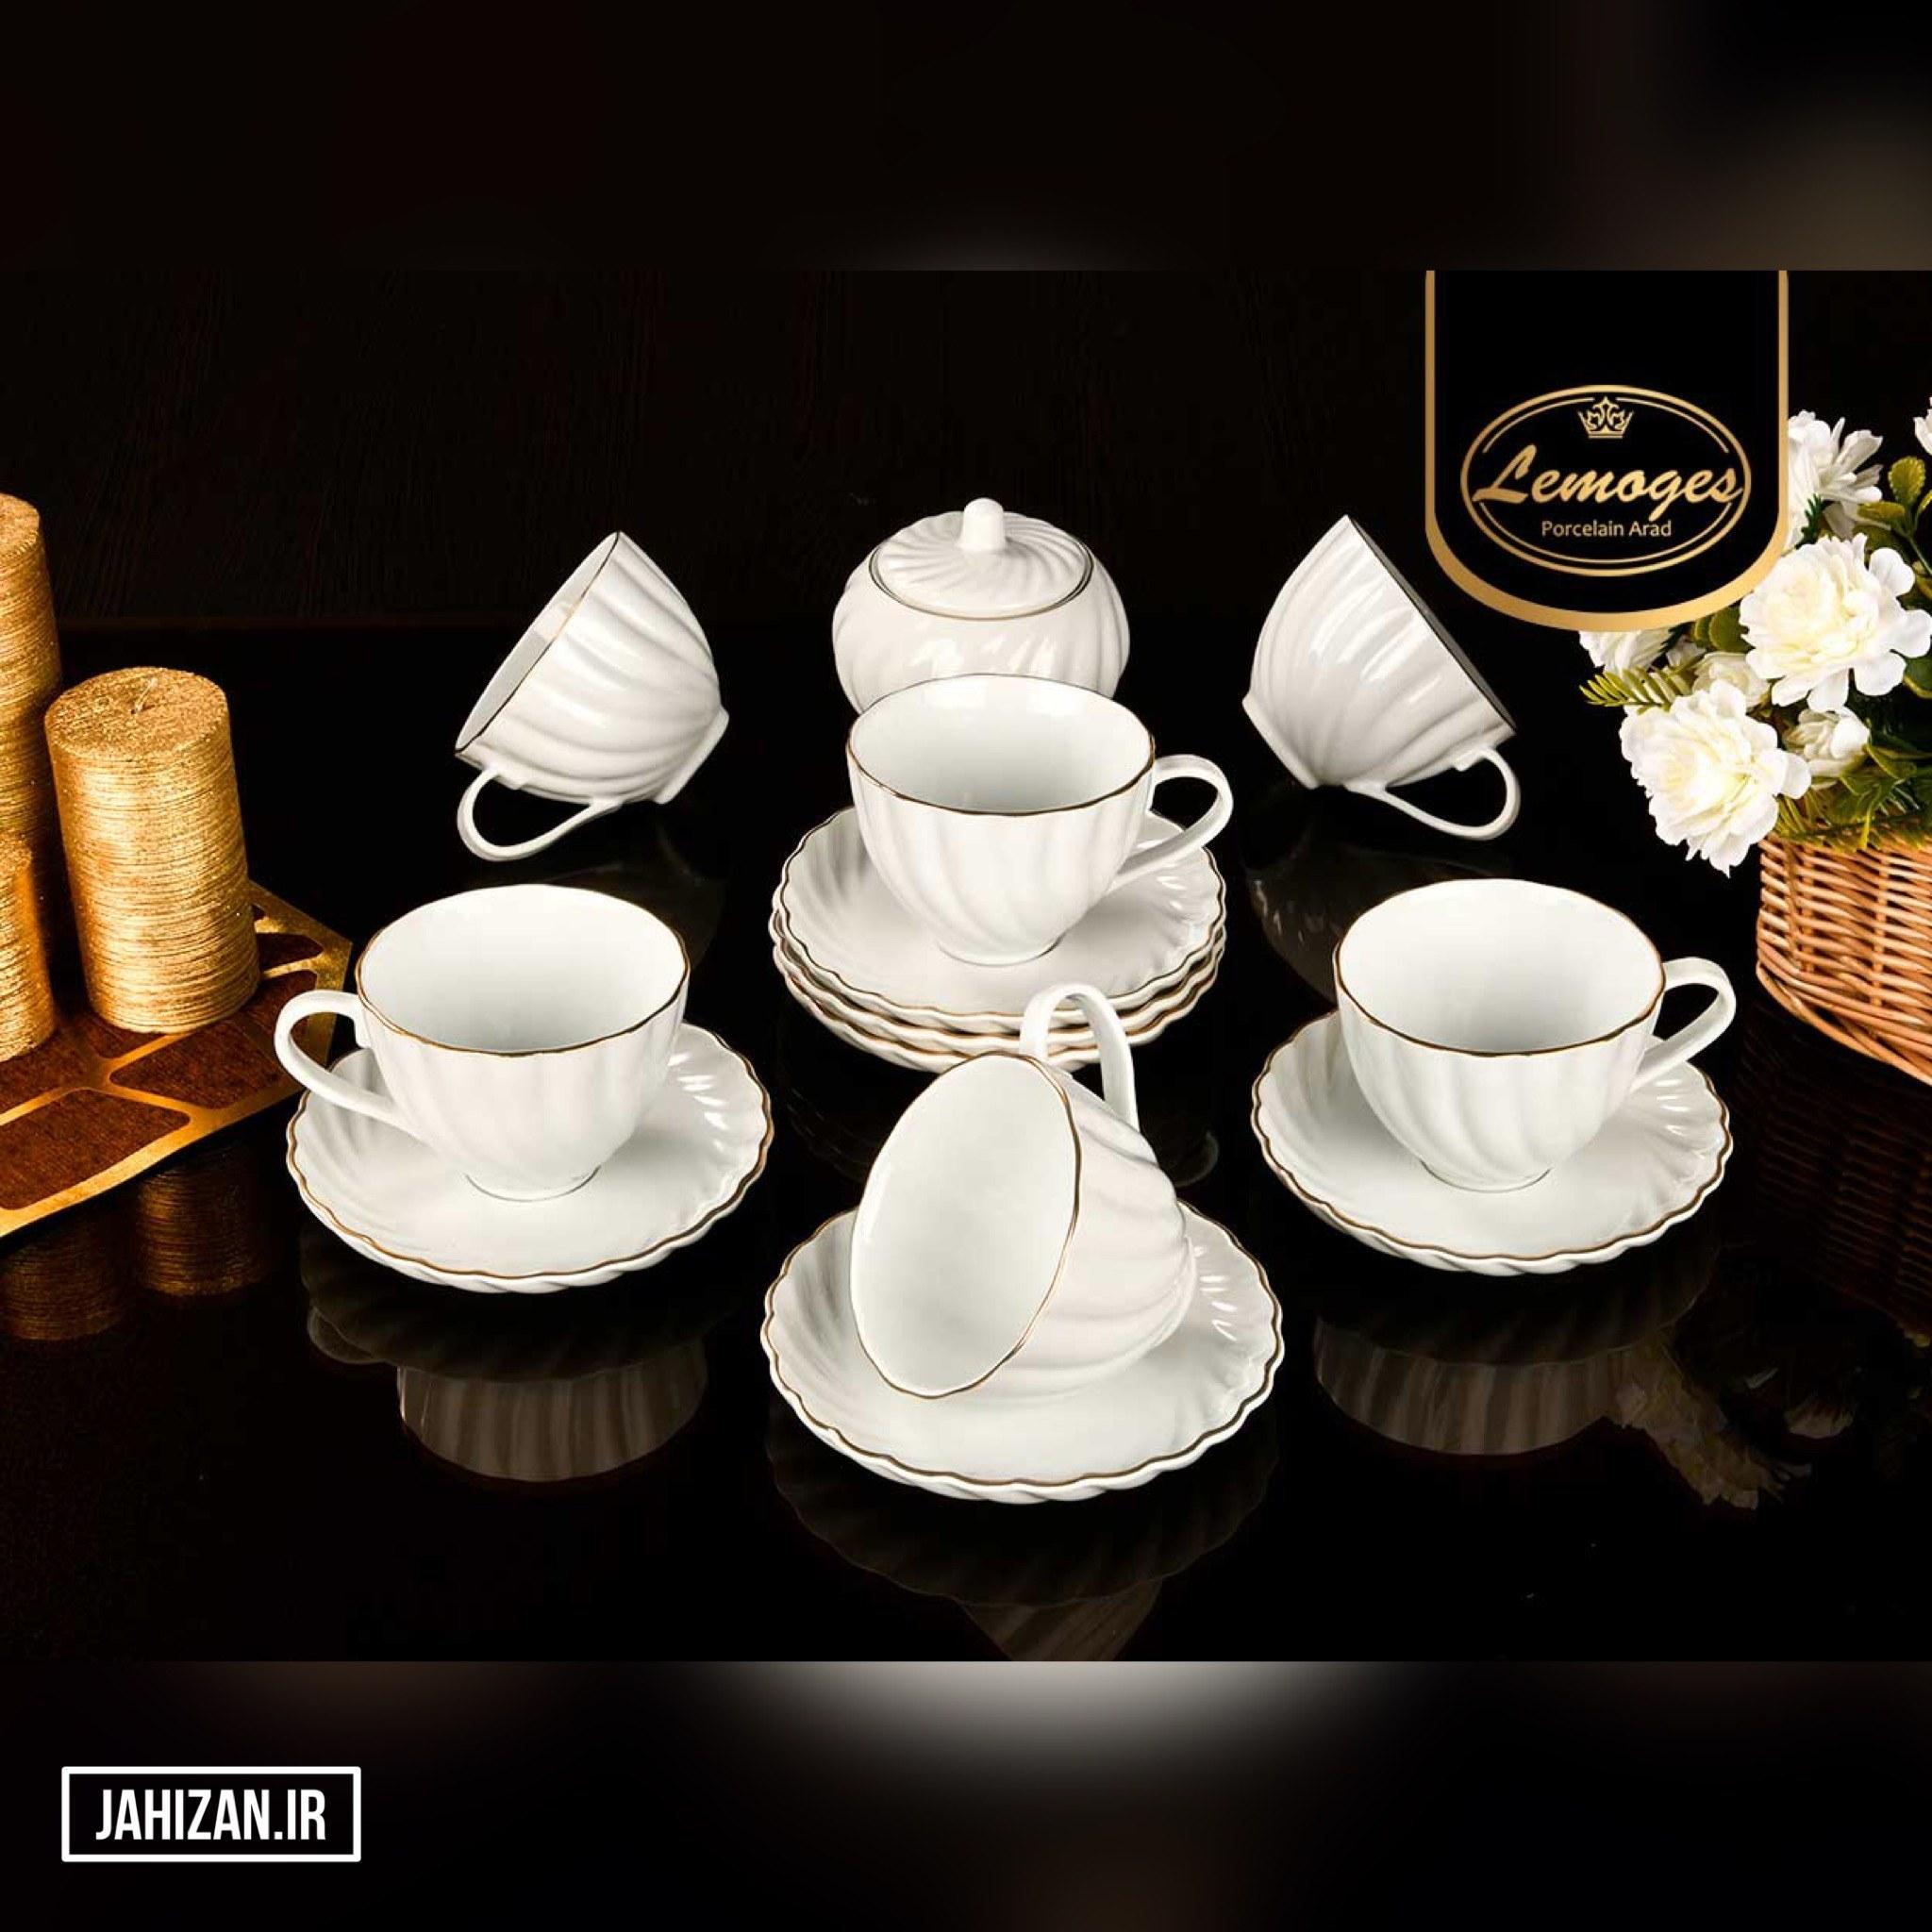 تصویر سرویس 14پارچه چای خوری لب طلایی مدل کارمن چینی لمون